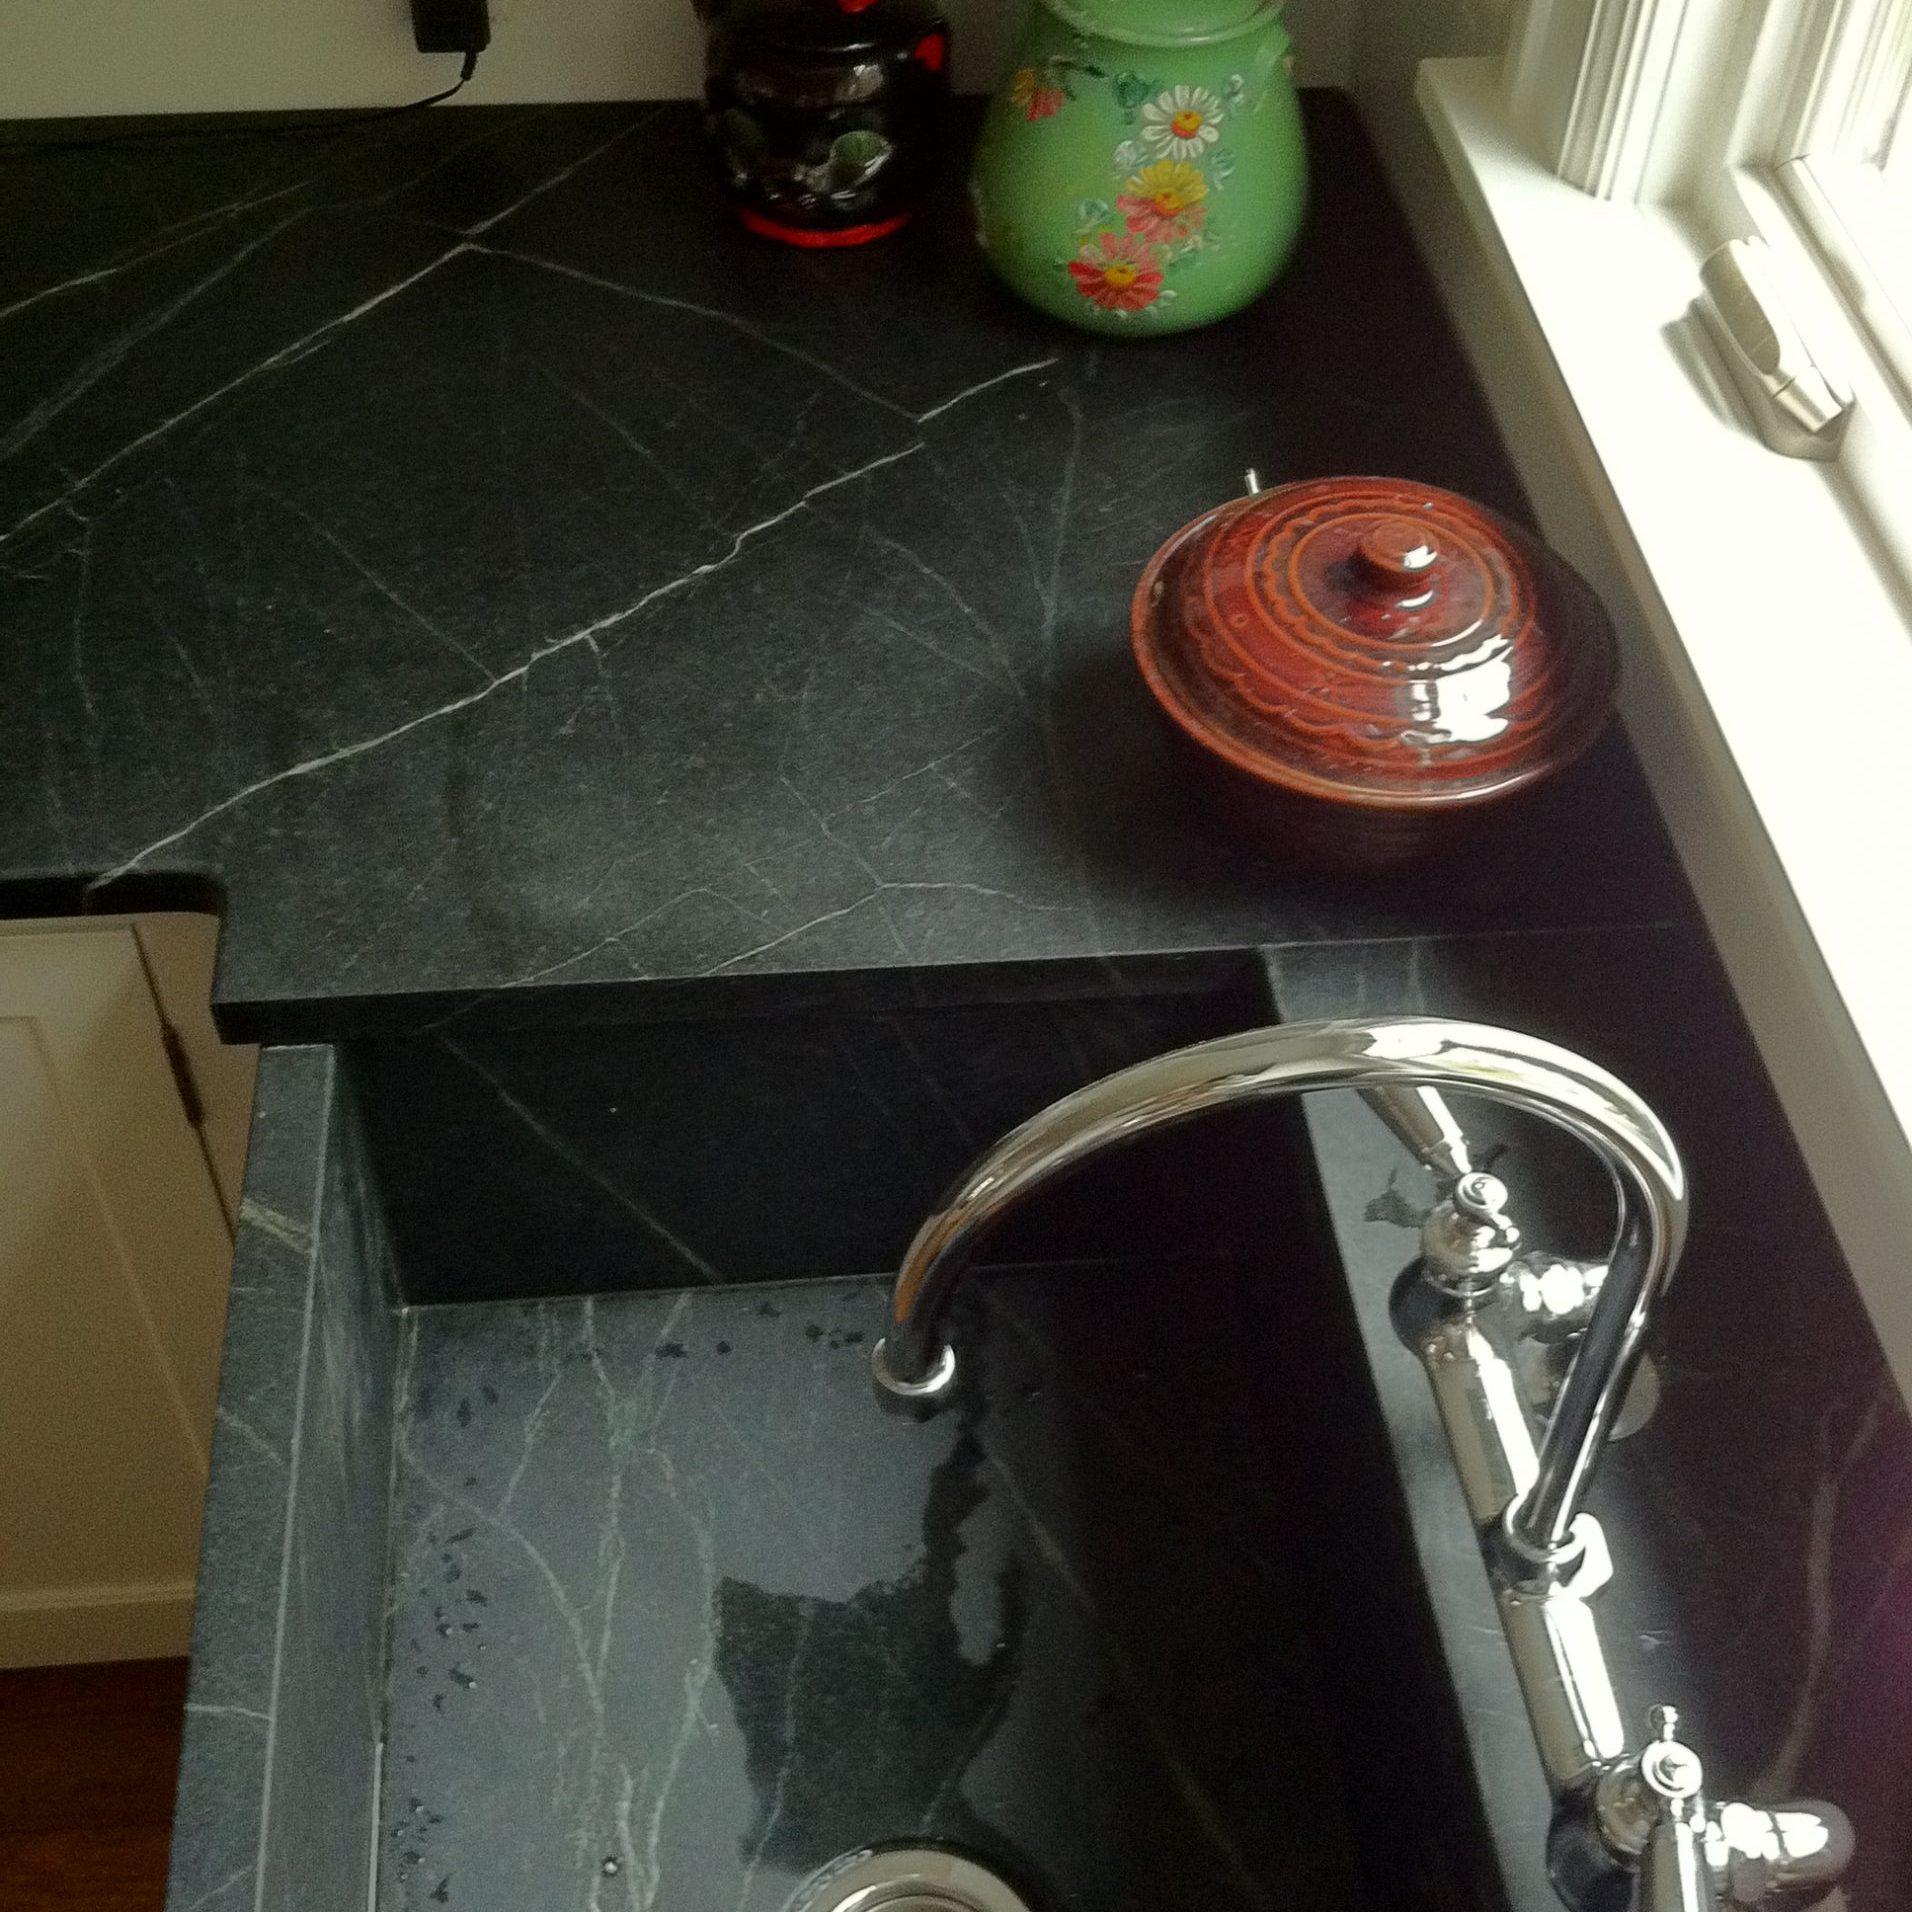 Dark stone countertop with stone sink basin